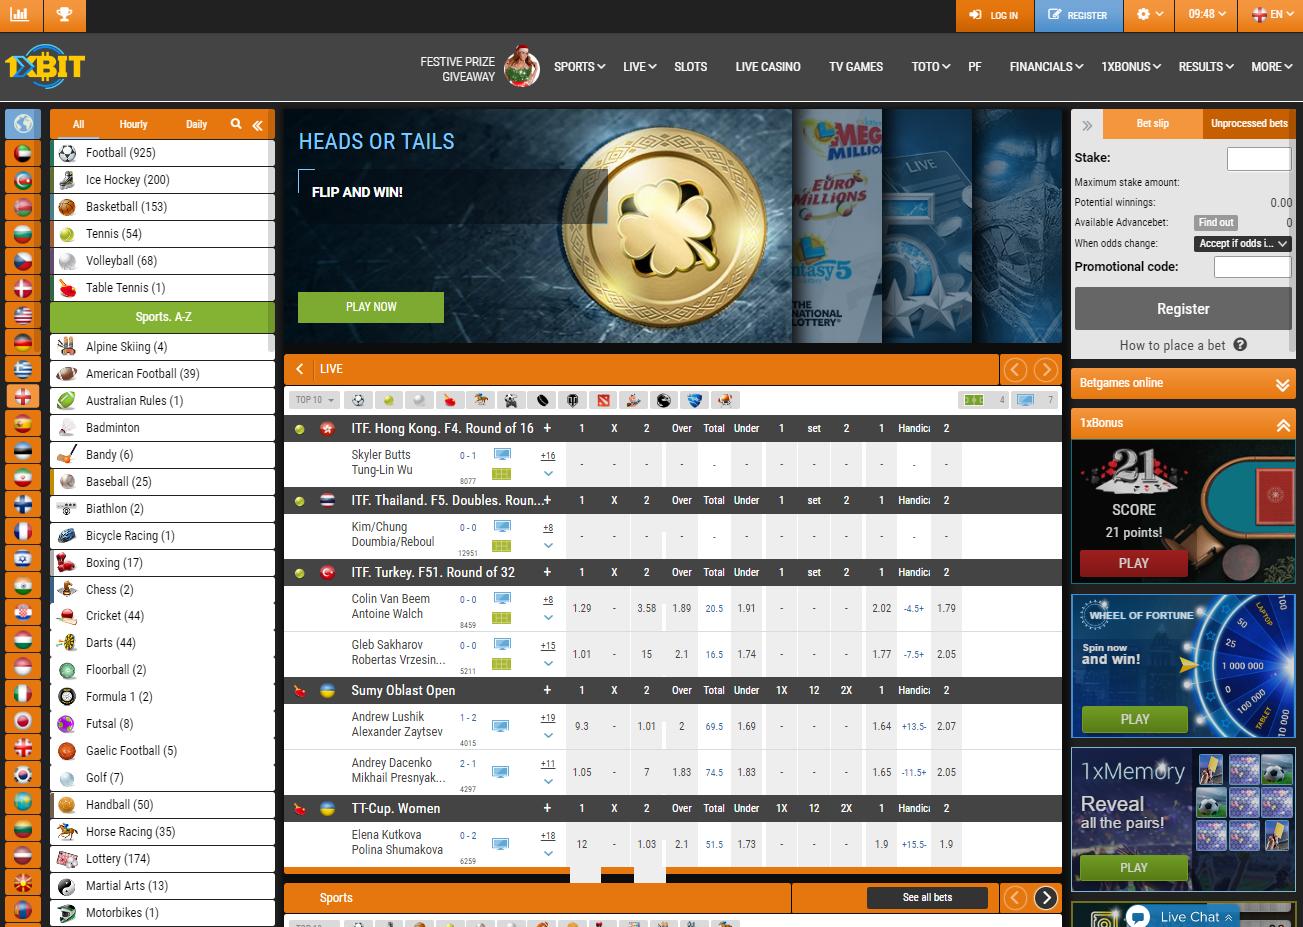 1Xbit homepage